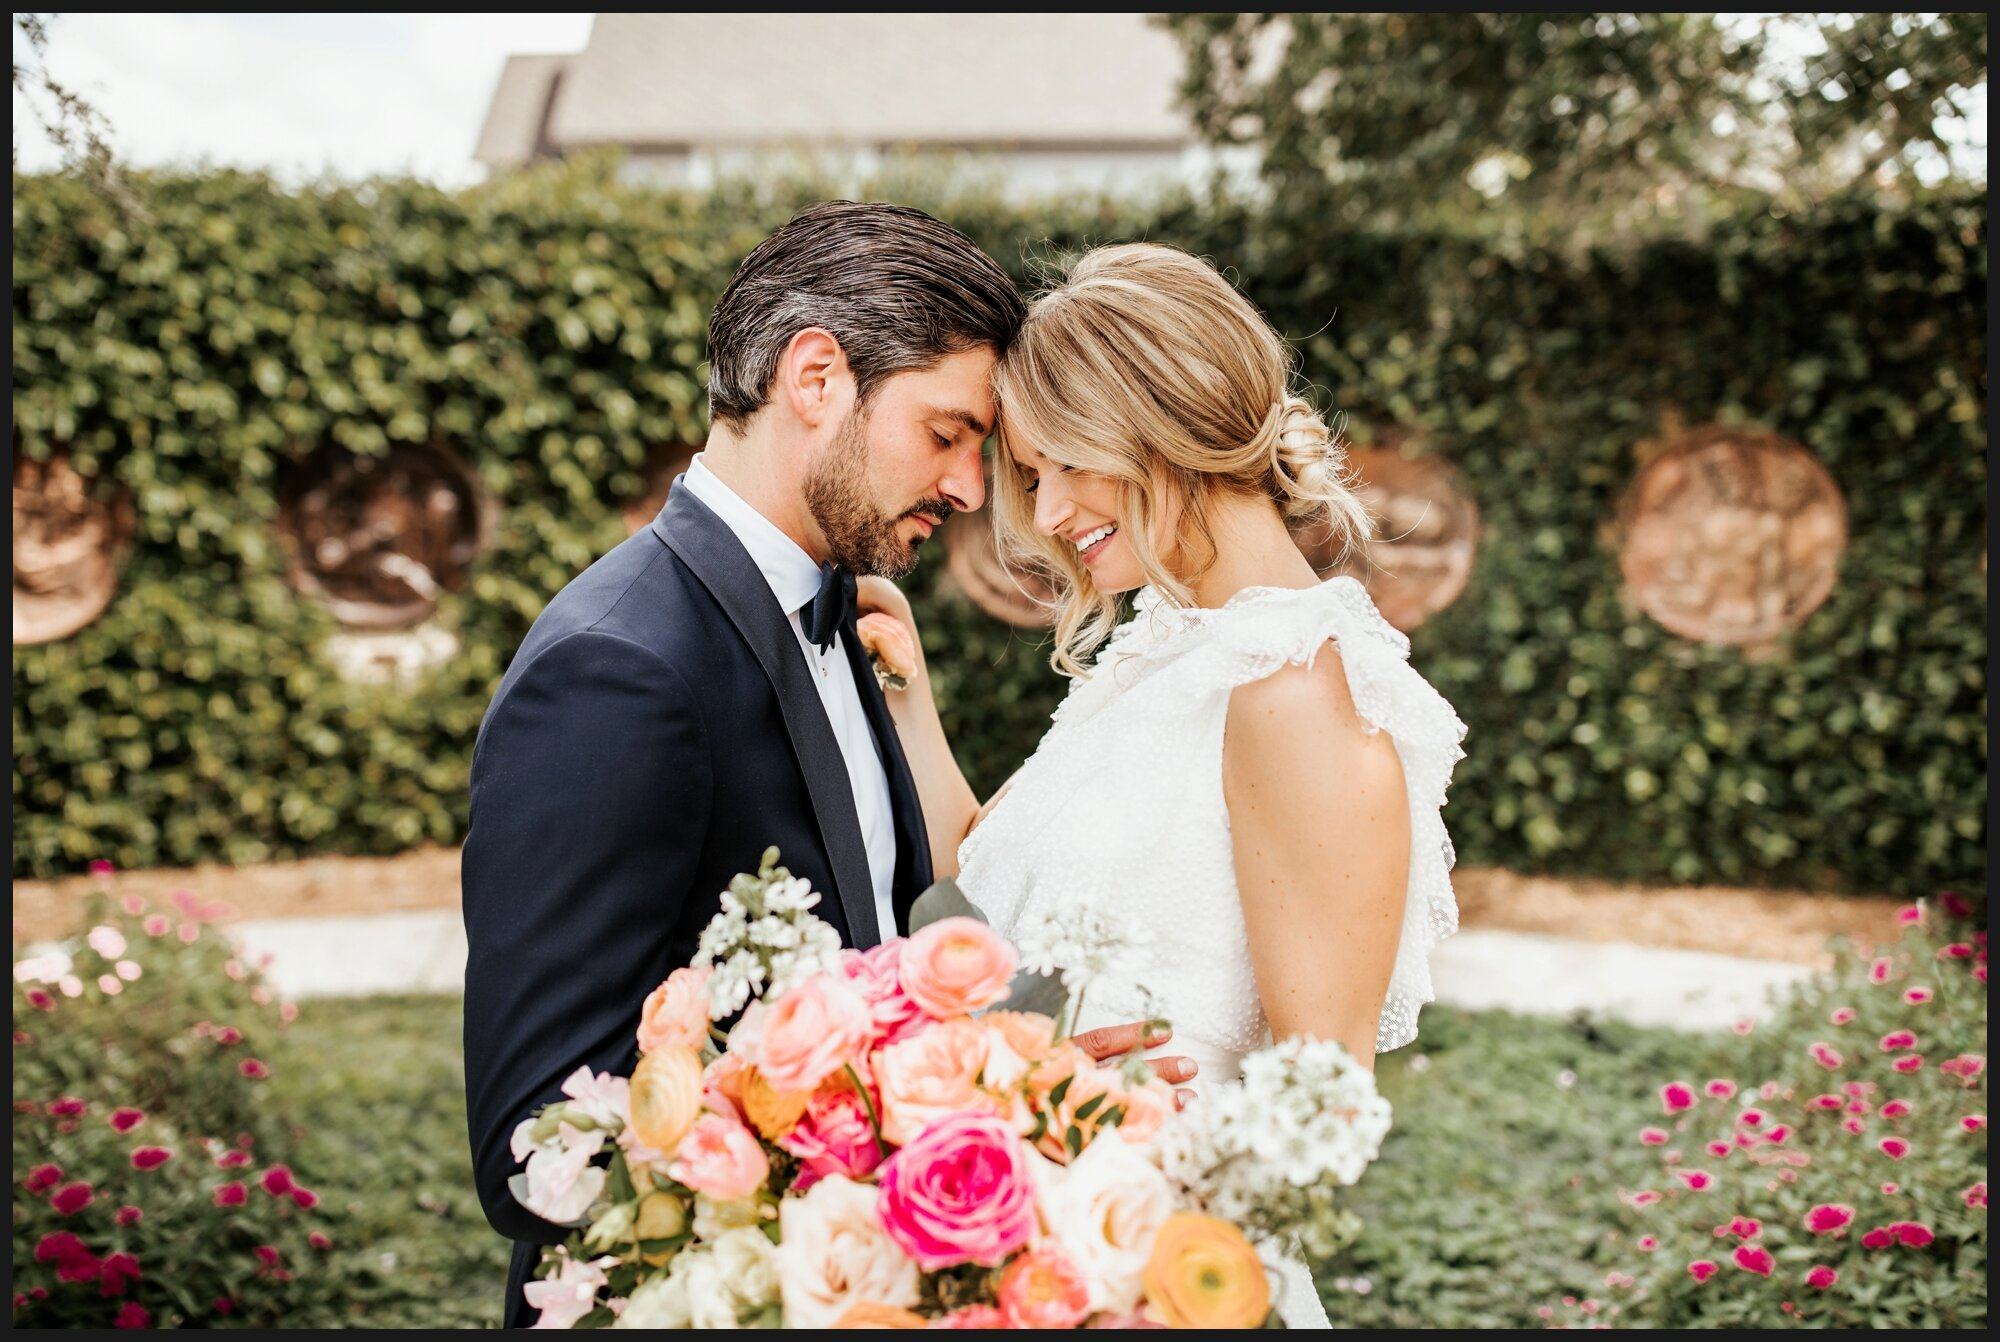 Orlando-Wedding-Photographer-destination-wedding-photographer-florida-wedding-photographer-hawaii-wedding-photographer_0741.jpg